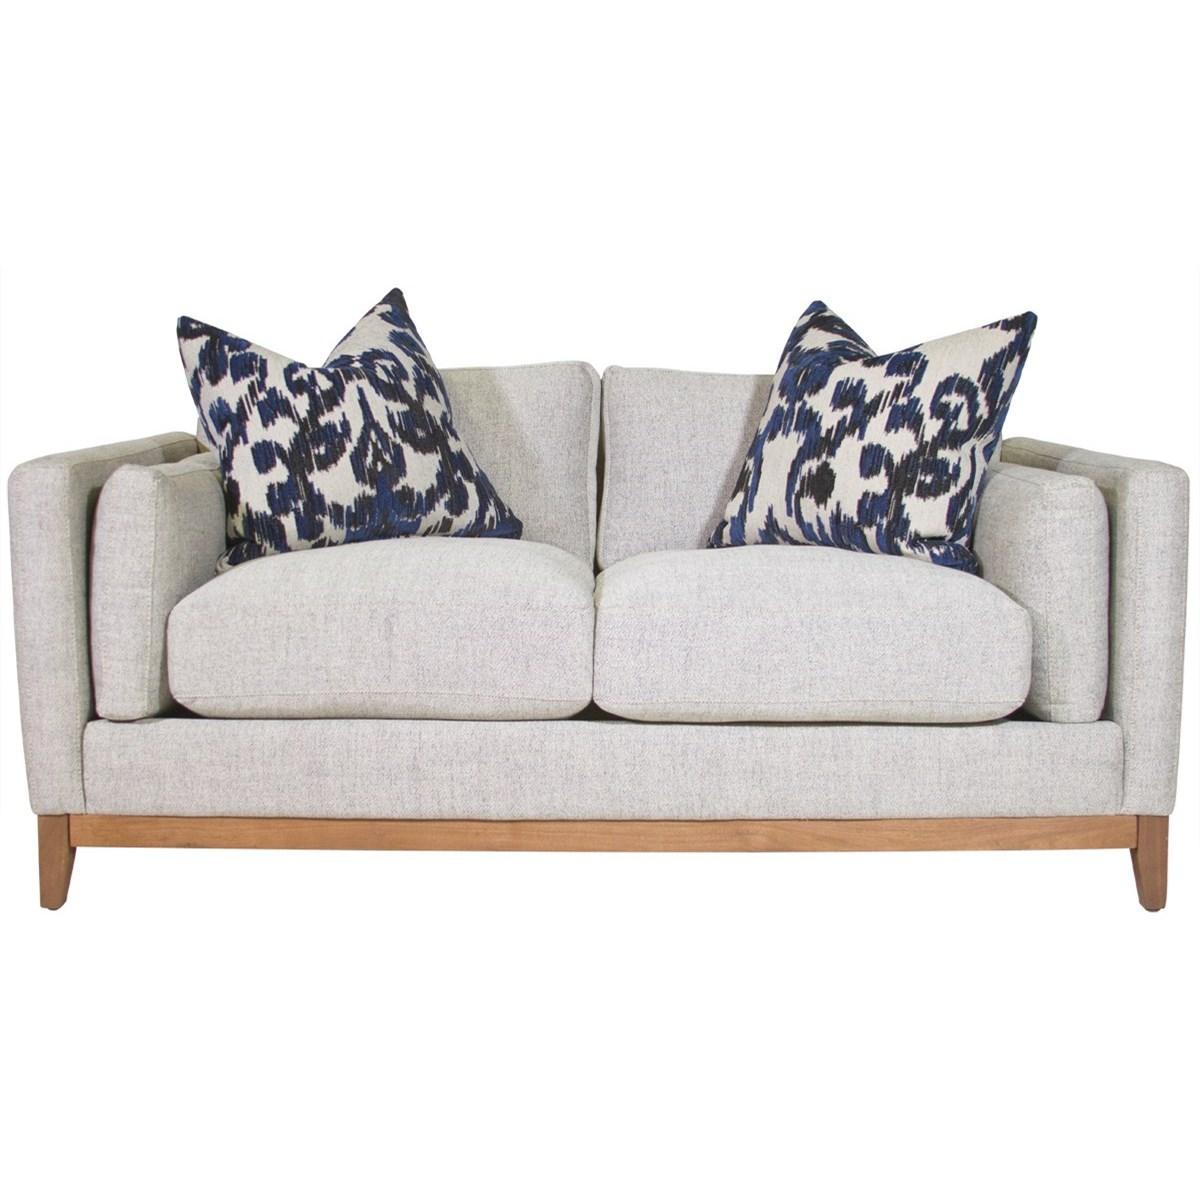 Kelsey Condo Sofa by Jonathan Louis at HomeWorld Furniture